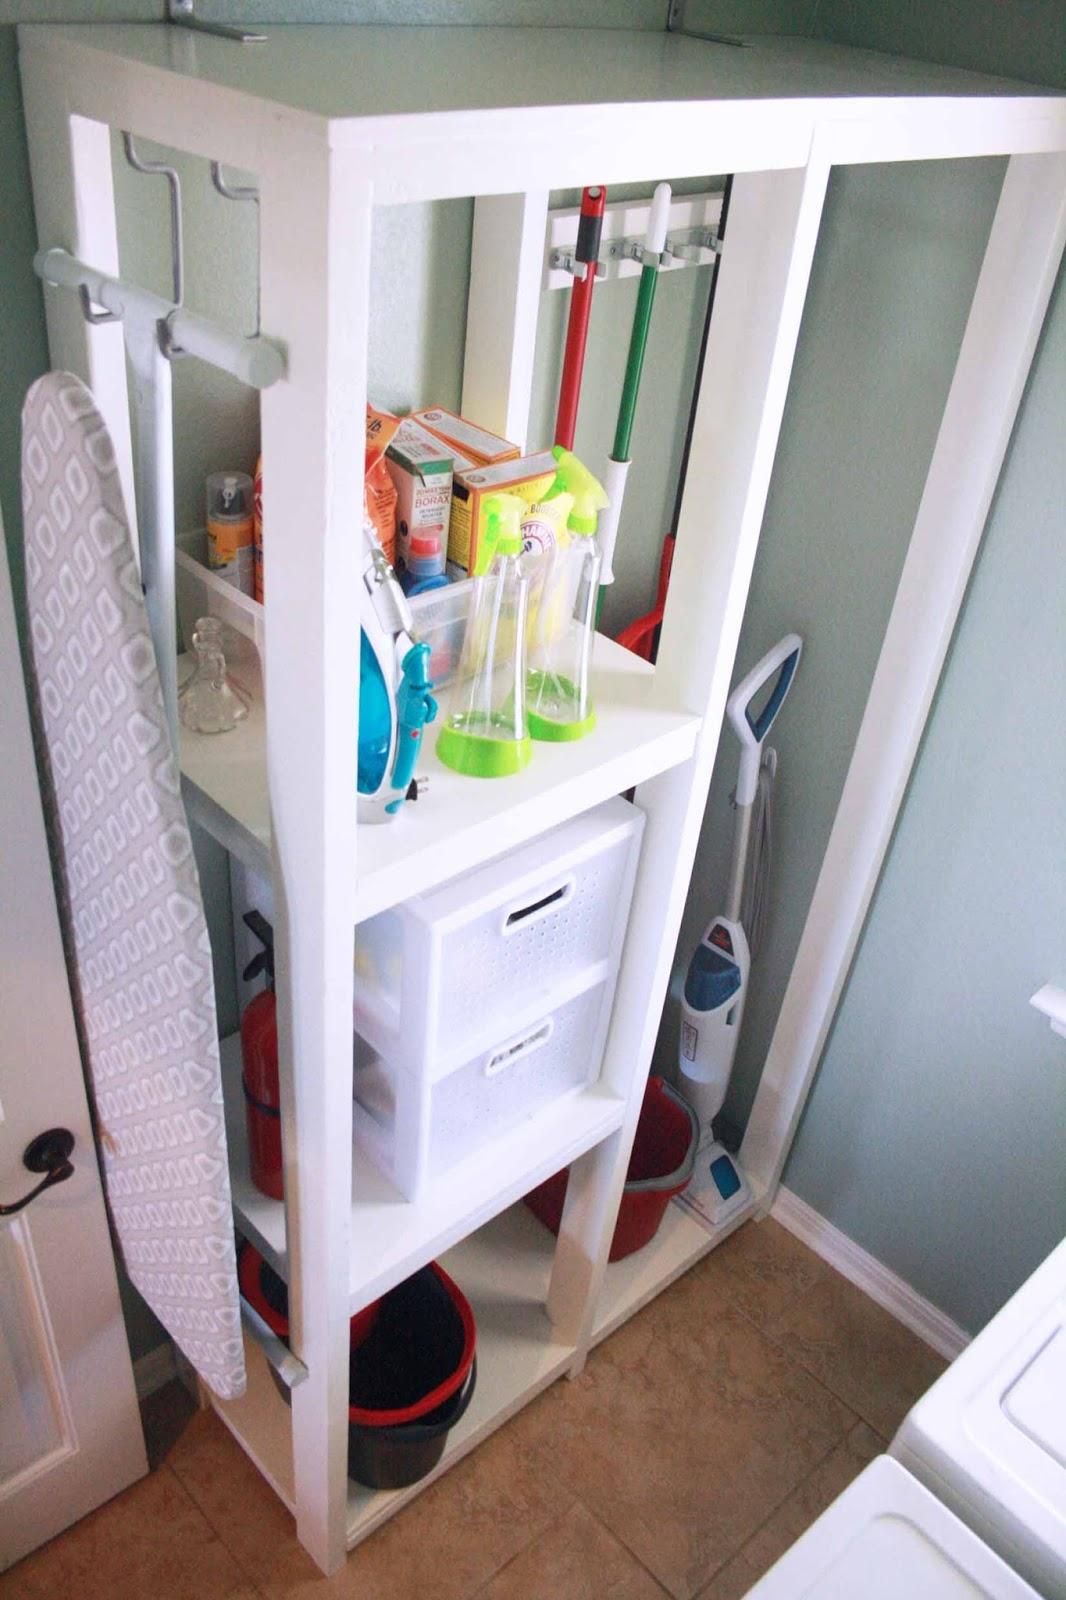 DIY Laundry Room Storage Tower | Summer Owens